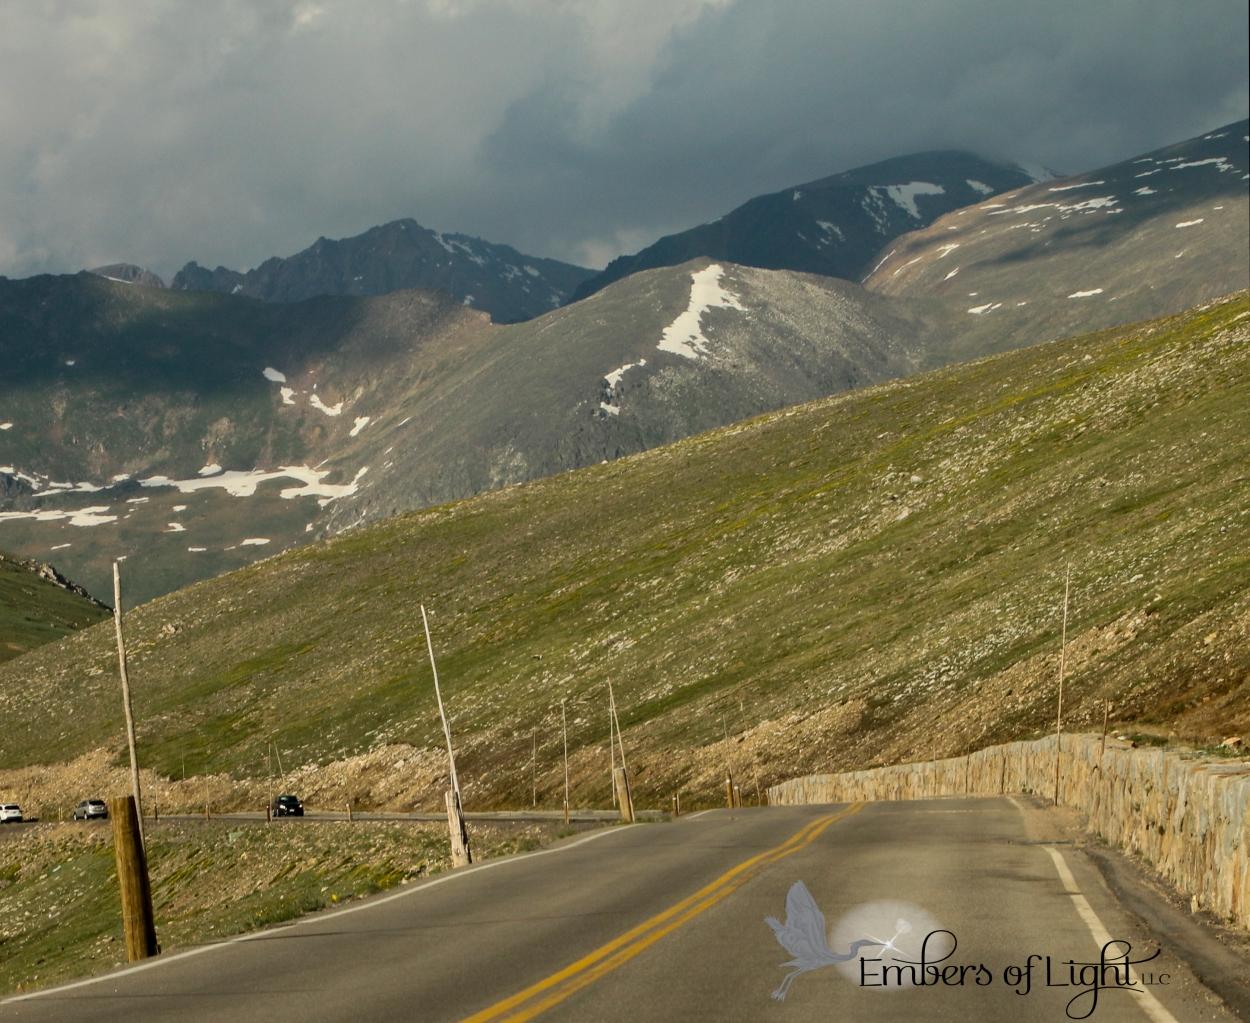 RMNP, Rocky Mountain National Park